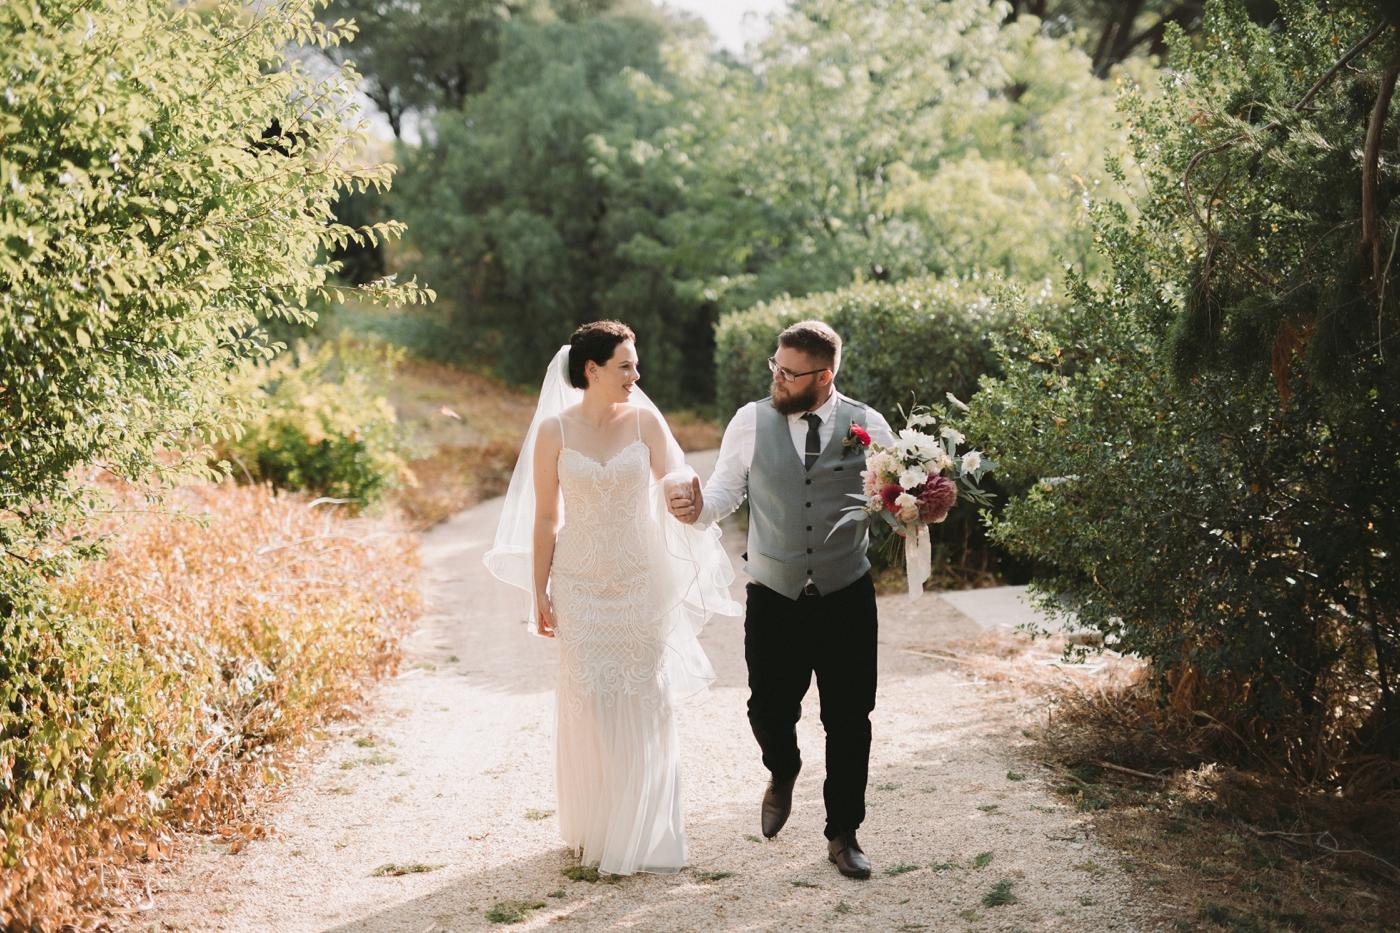 Emma & Aaron - Marybank Estate Wedding - Natural Wedding Photographer in Adelaide - Beautiful wedding photography - Katherine Schultz - www.katherineschultzphotography.com